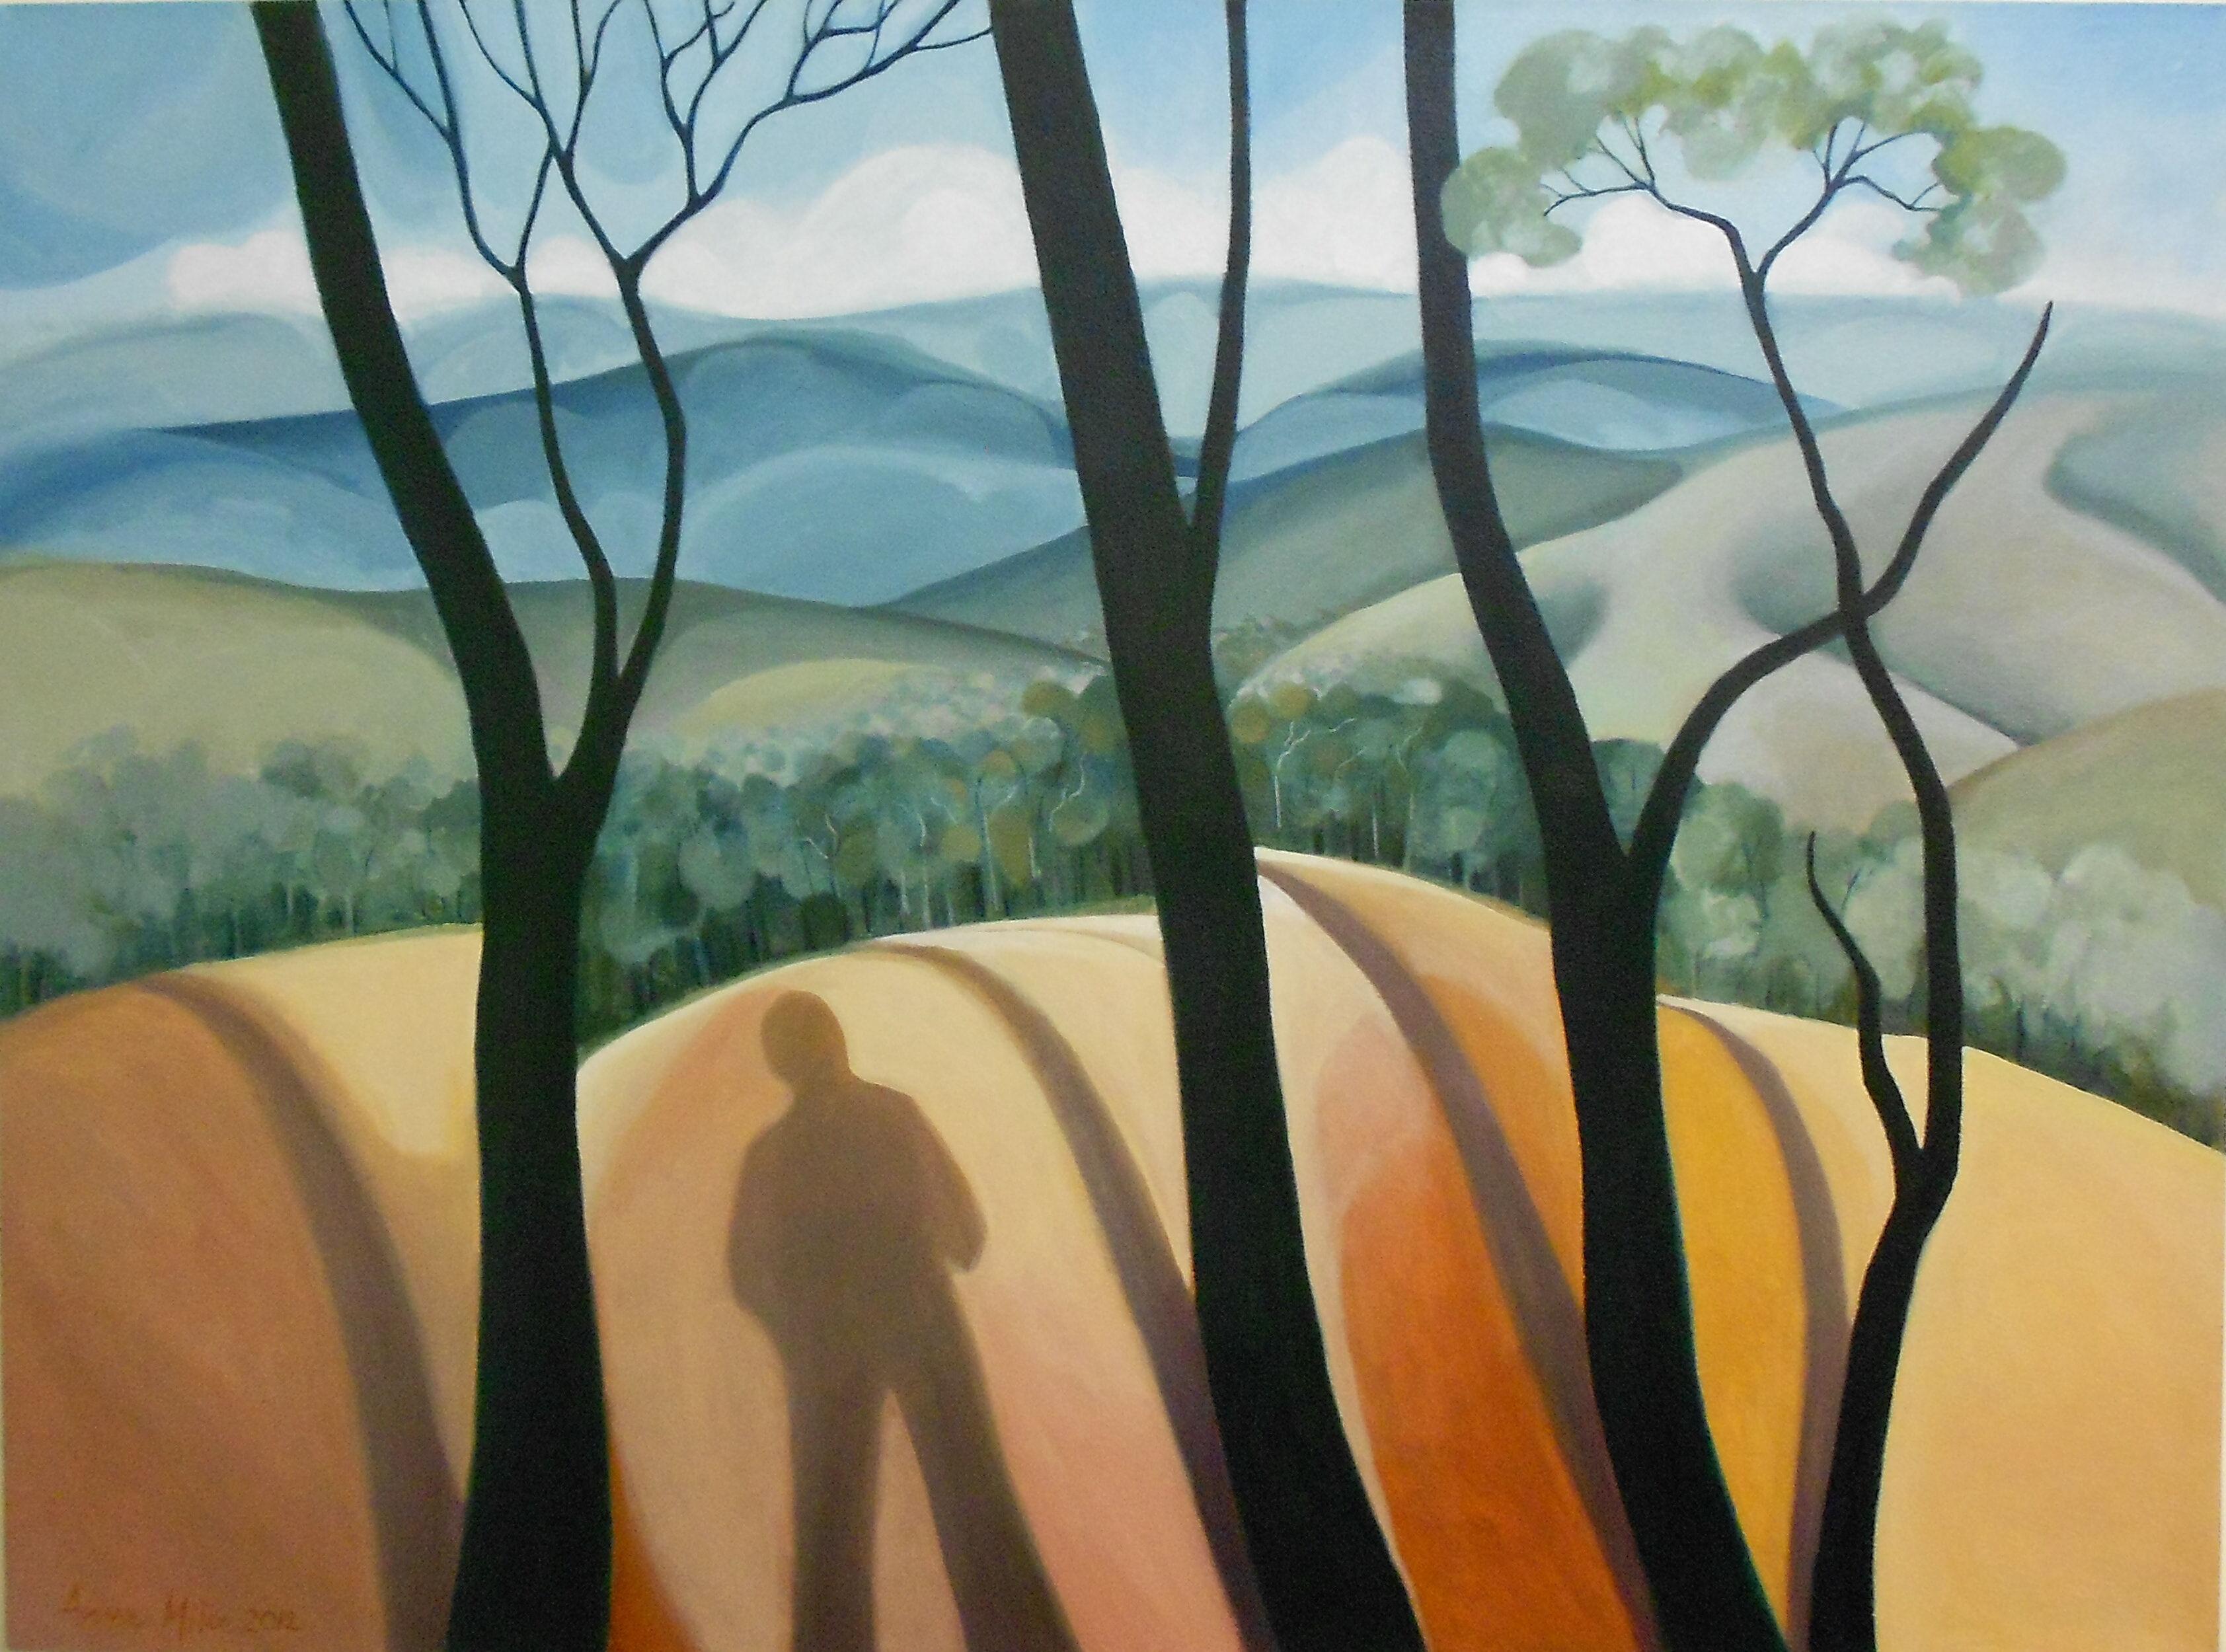 Charred Shadows - 150 x 110cms - Oil on canvas